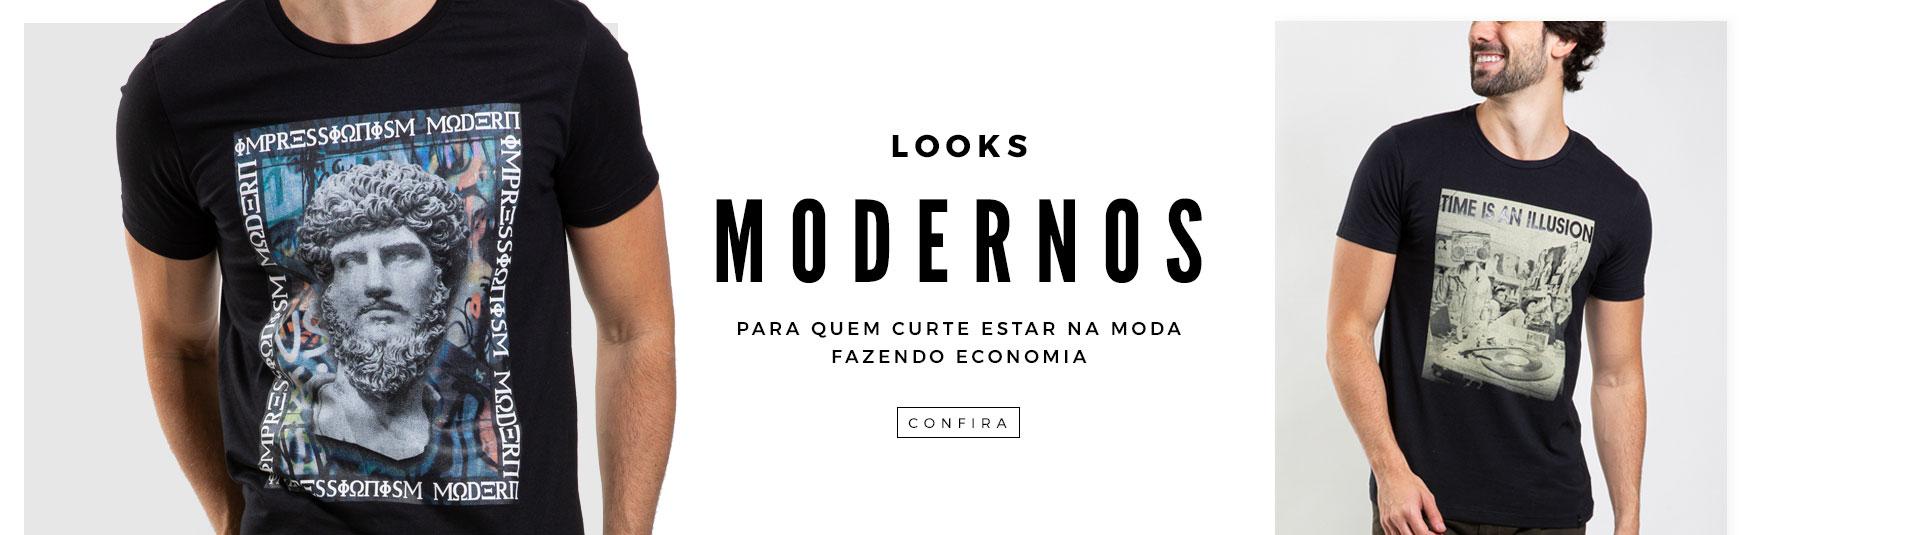 Looks Modernos